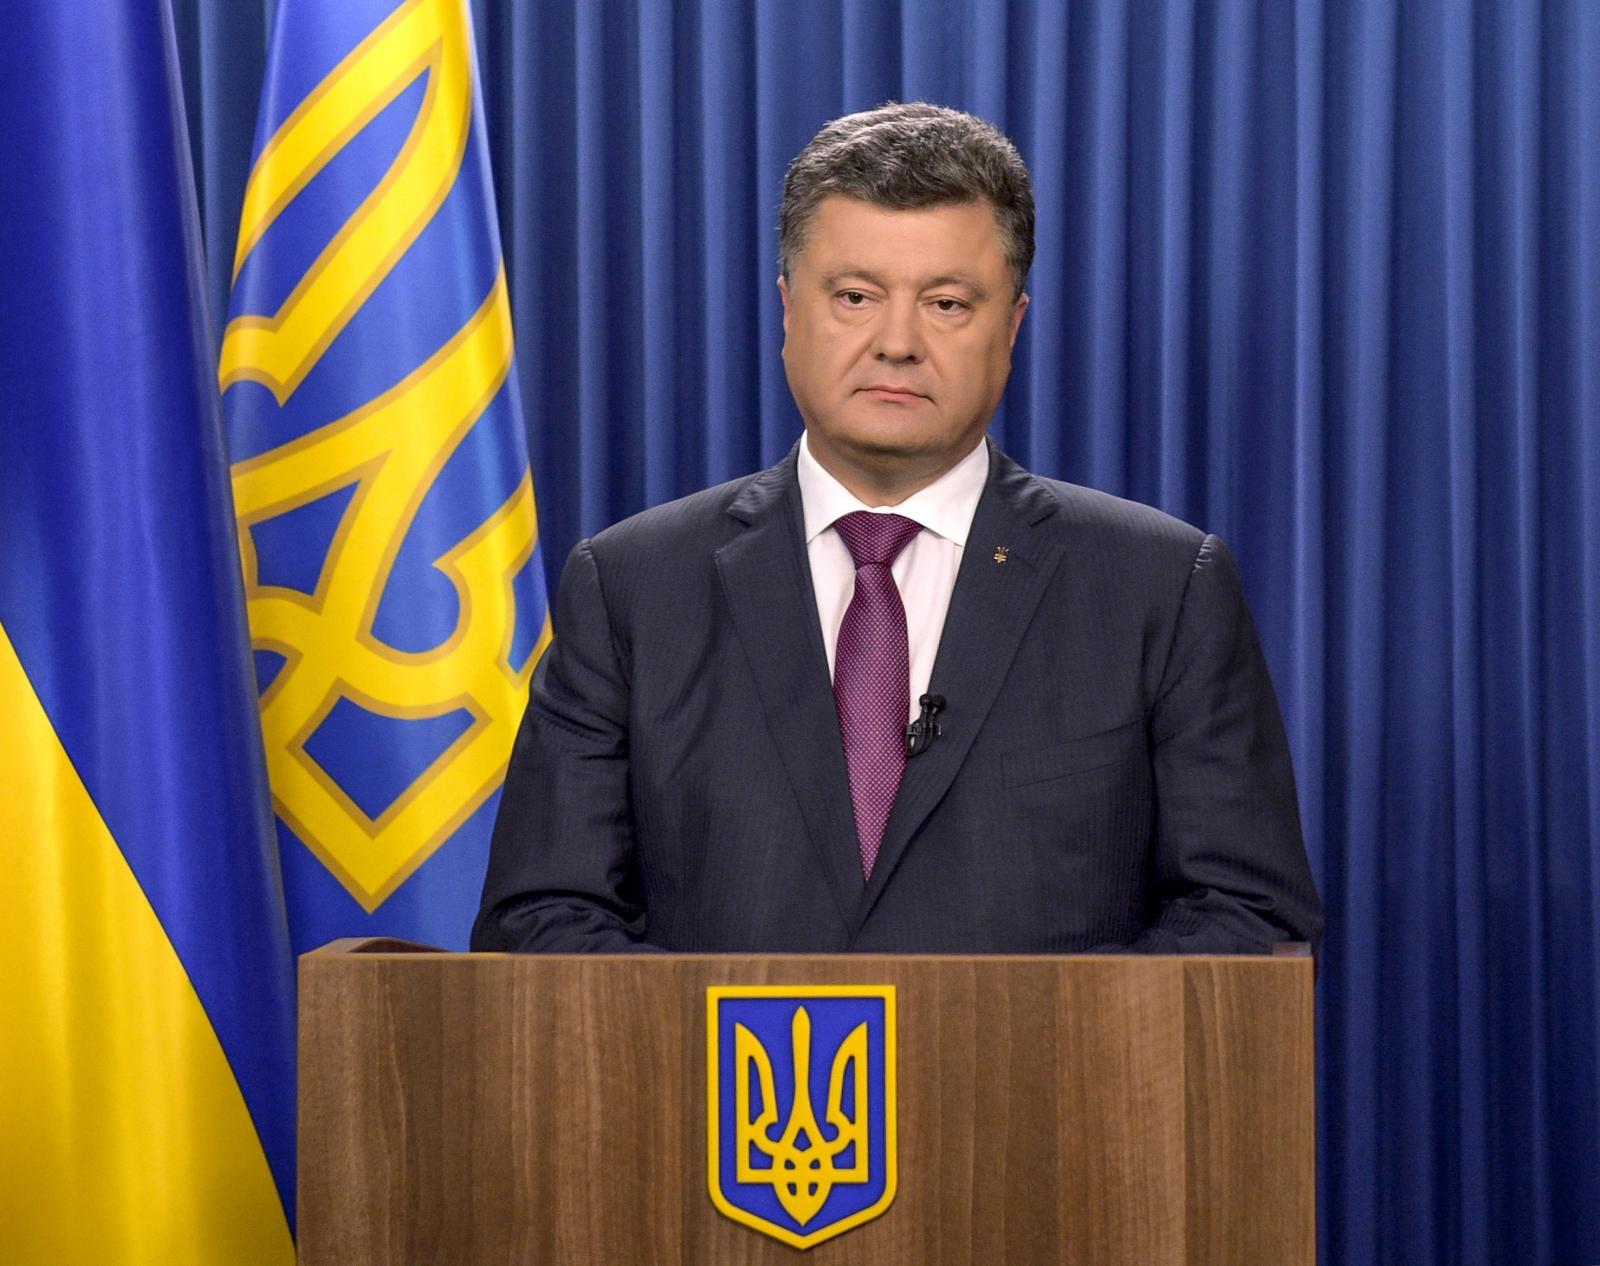 Ukraine's Poroshenko – we've listened to foreign partners on corruption law